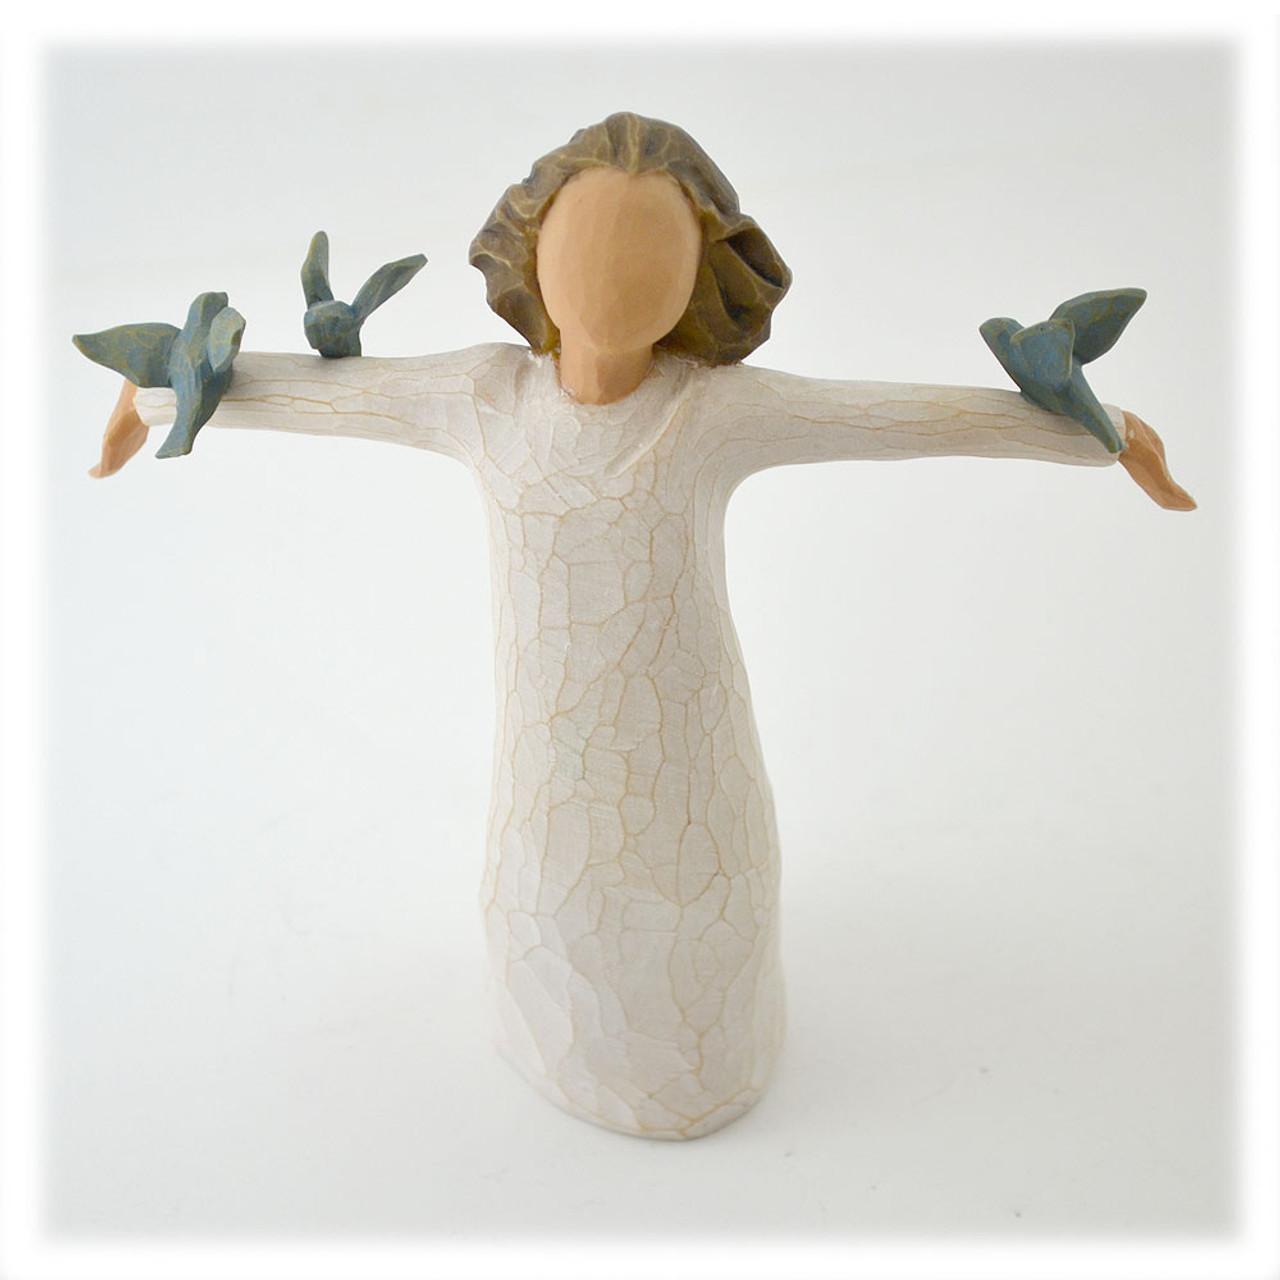 Happiness Willow Tree Figurine by Demdaco